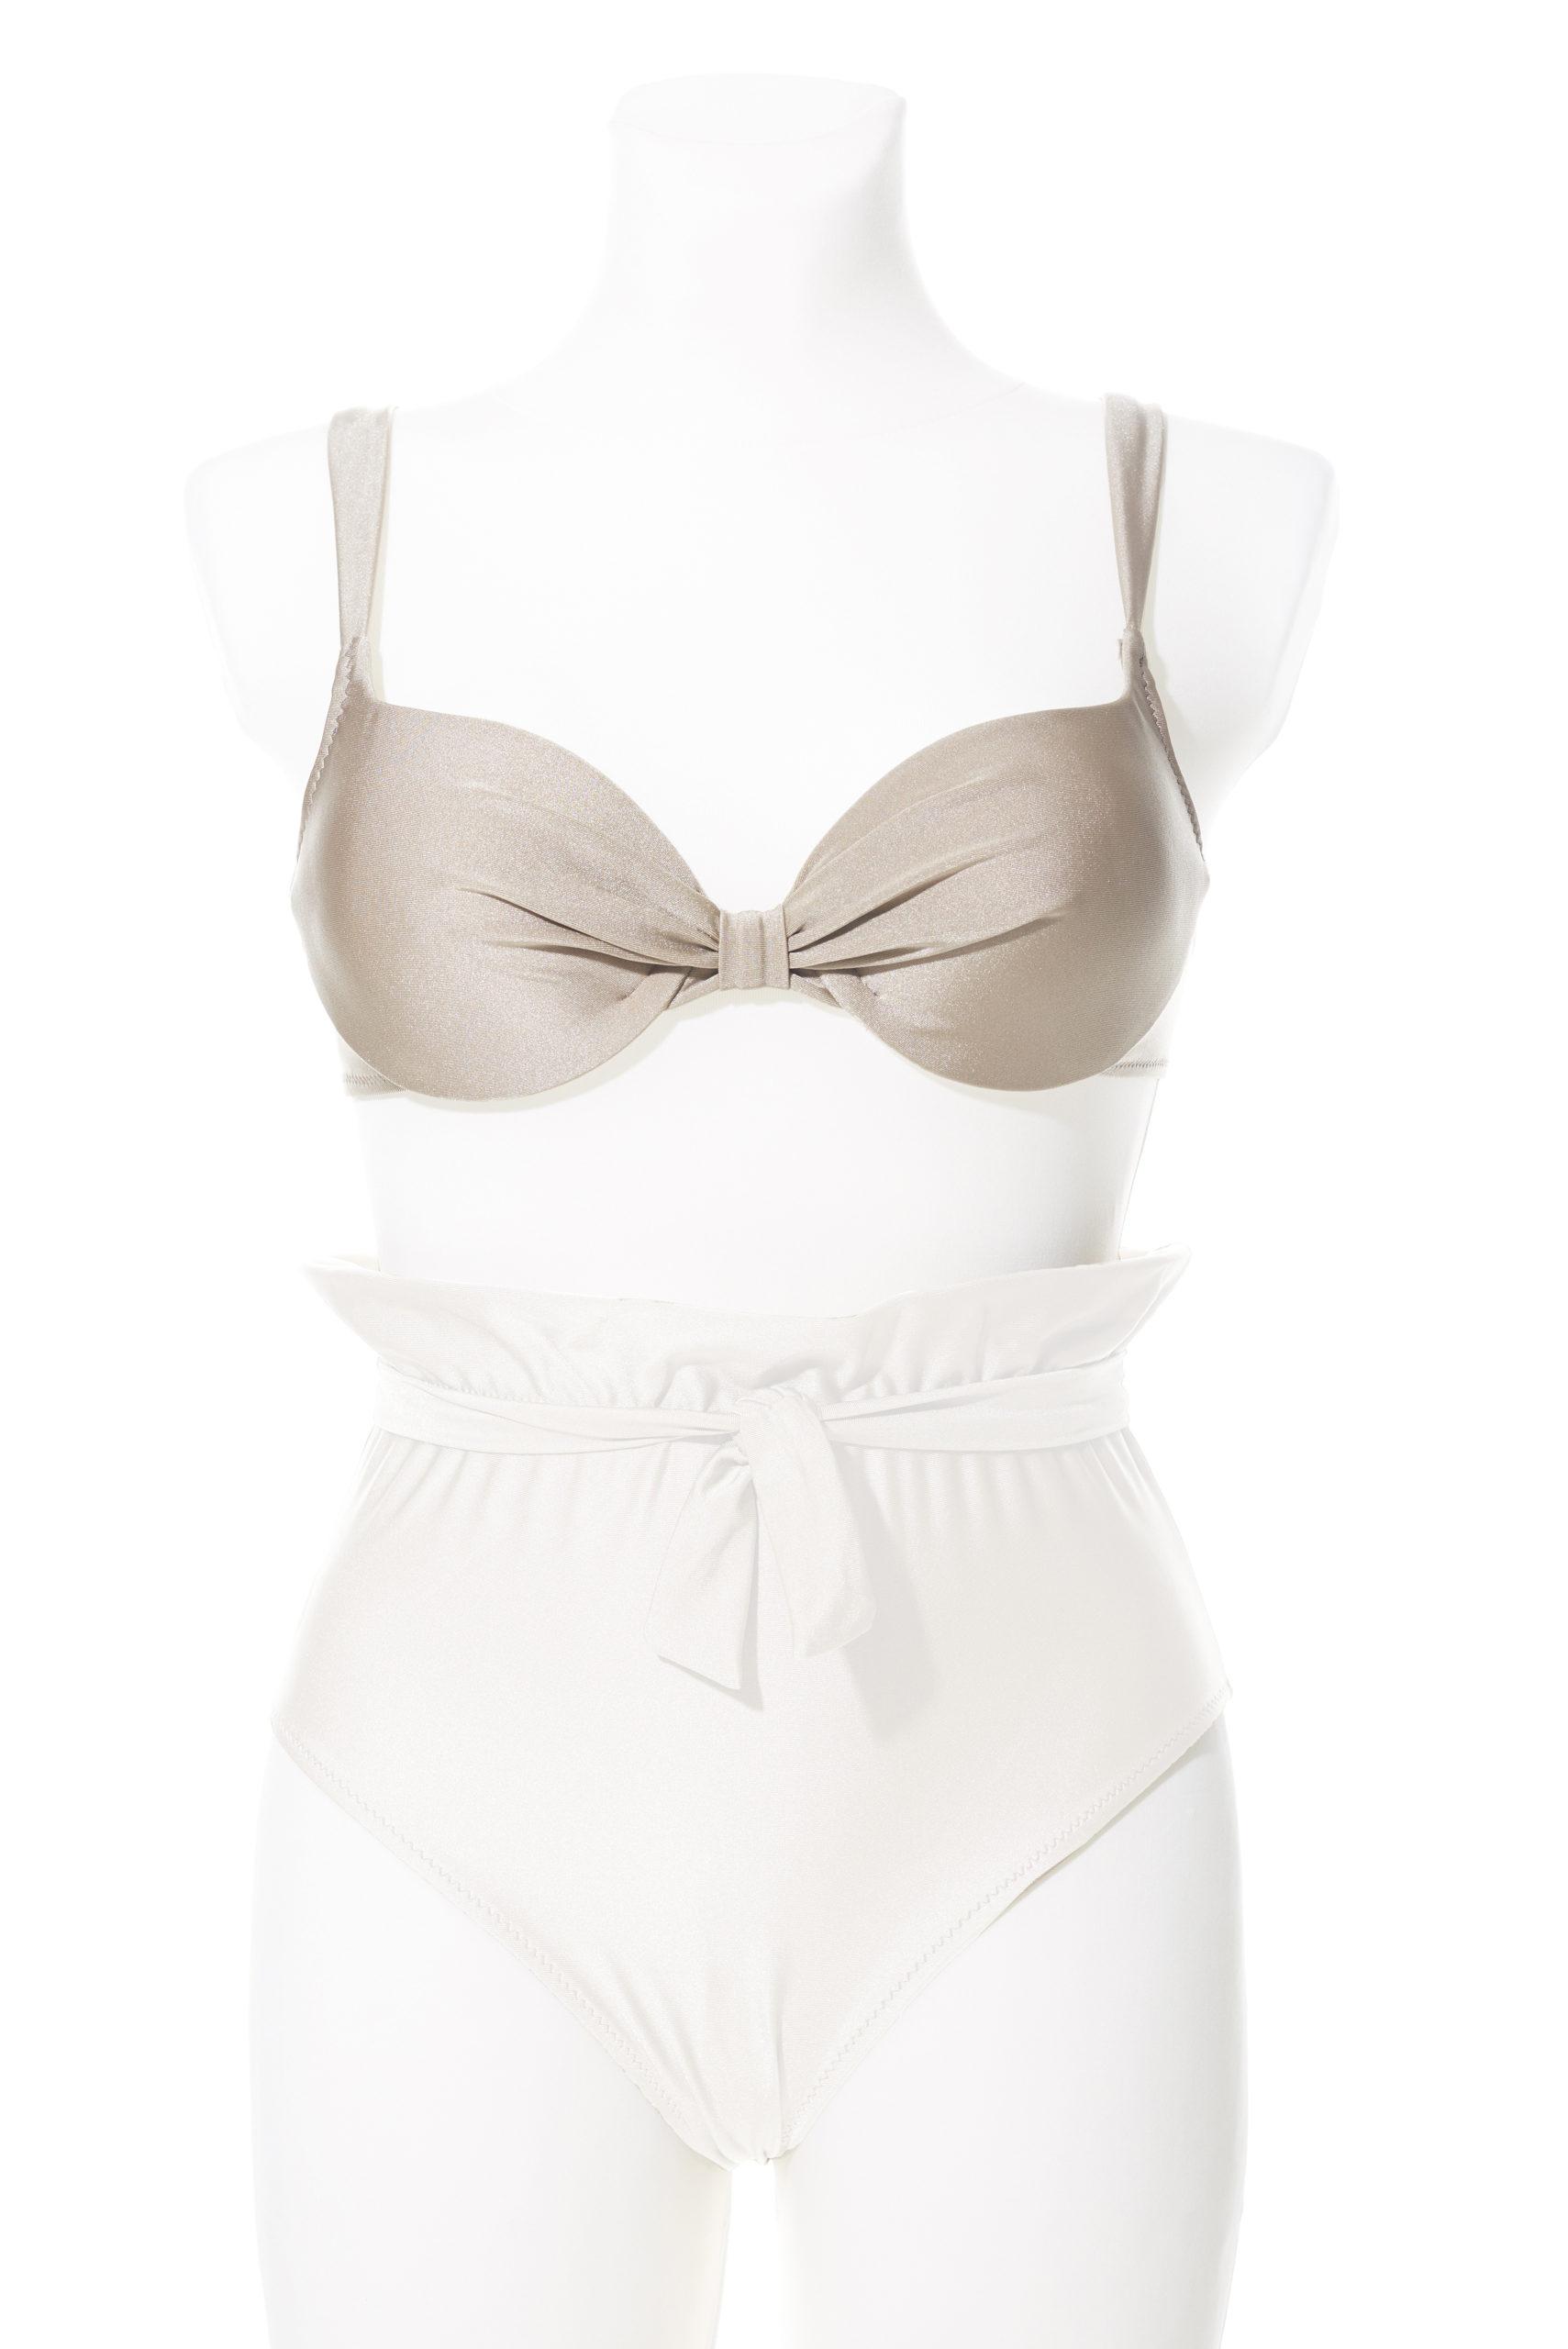 'SANDY' Bikini BH Form